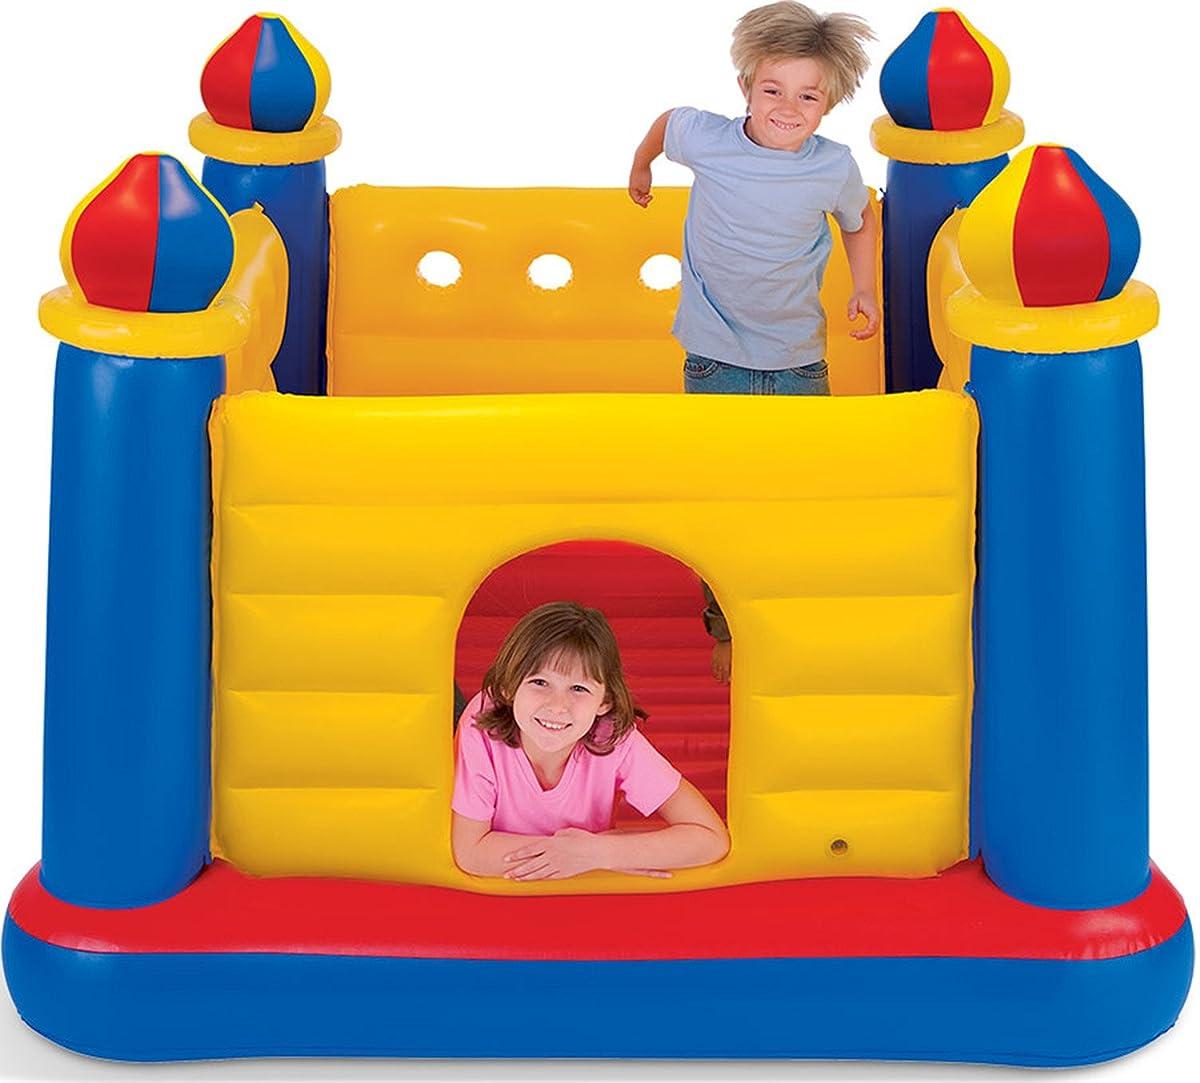 Intex Jump O Lene Castle Inflatable Bouncer, for Ages 3-6